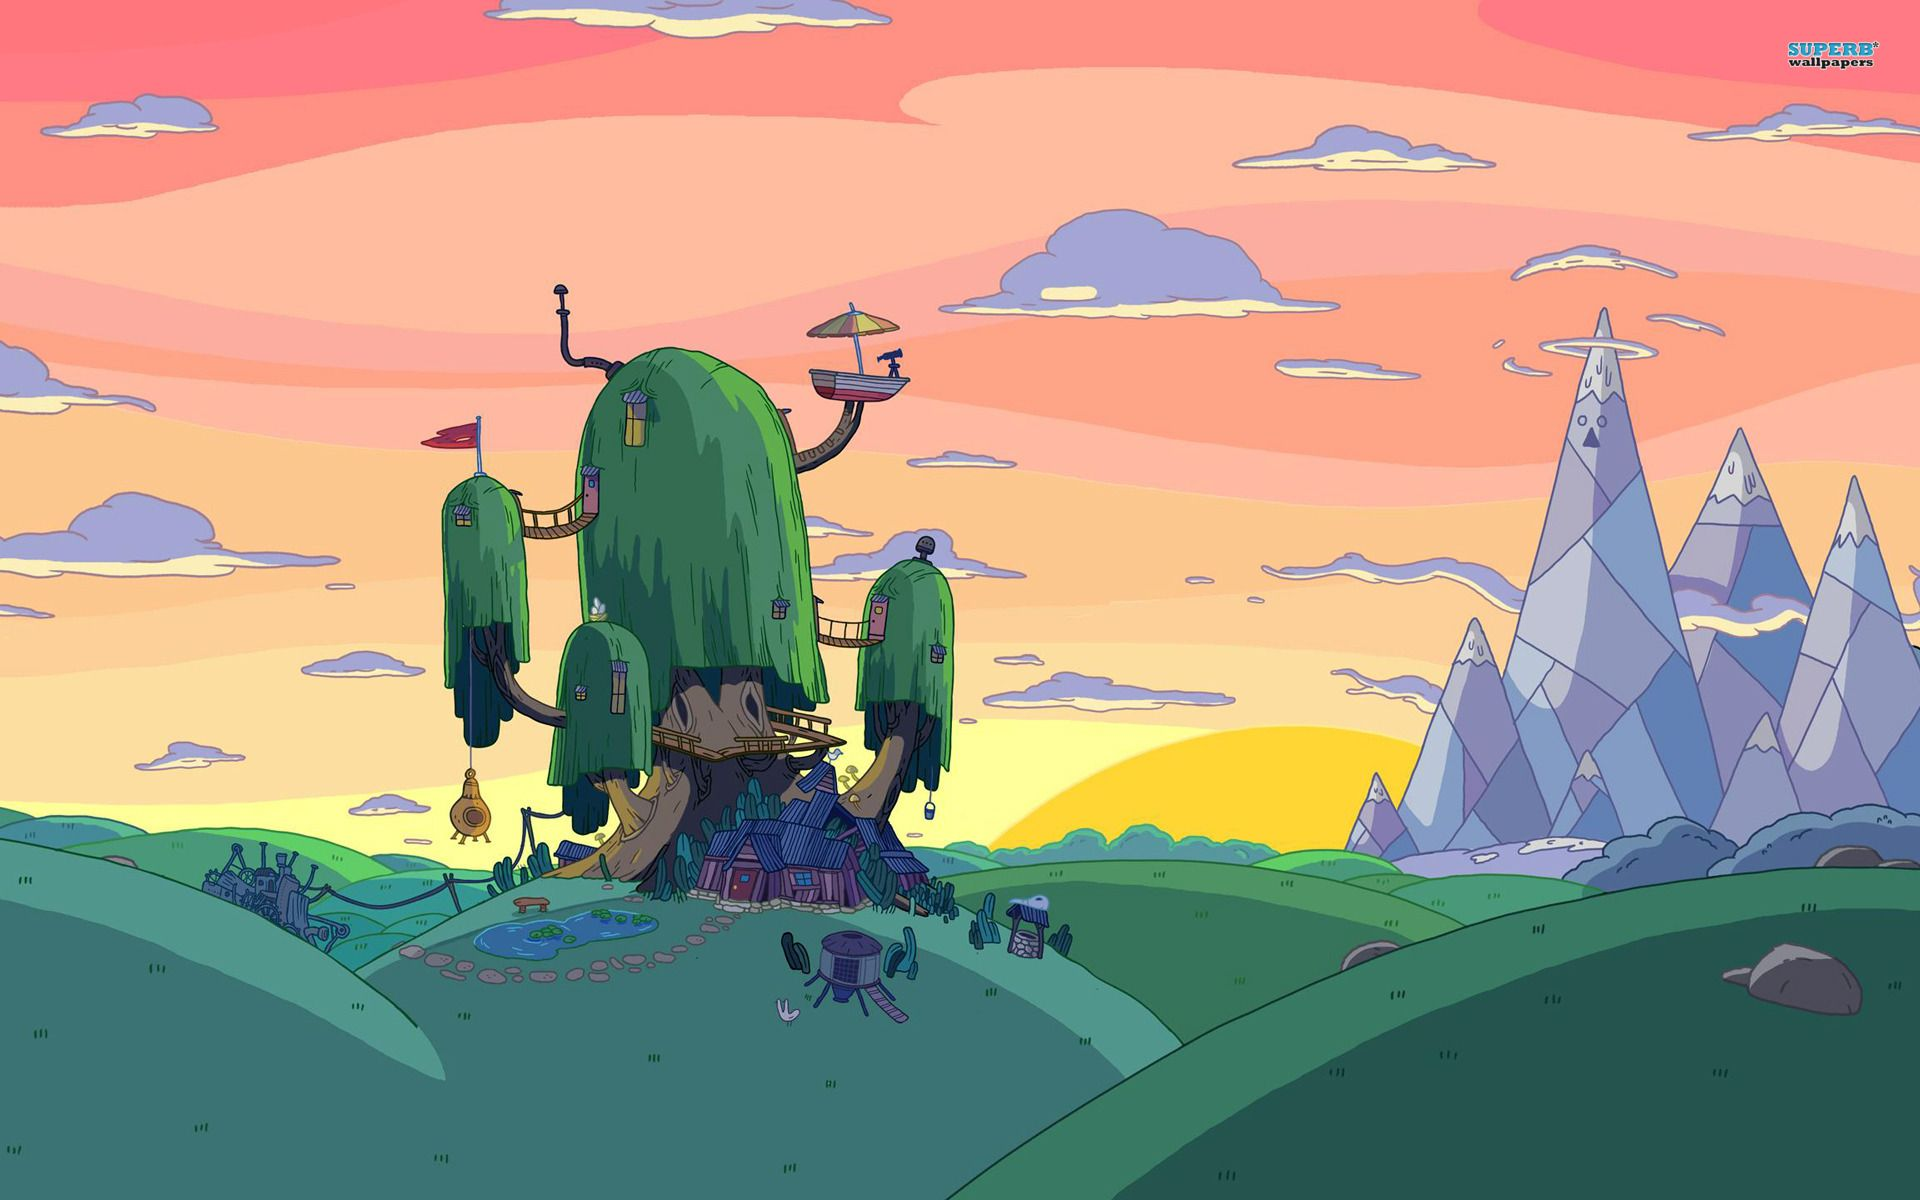 Adventure Time Landscape Google Search Jake De Adventure Time Finn De Horas De Aventura Fotos De Los Simpson